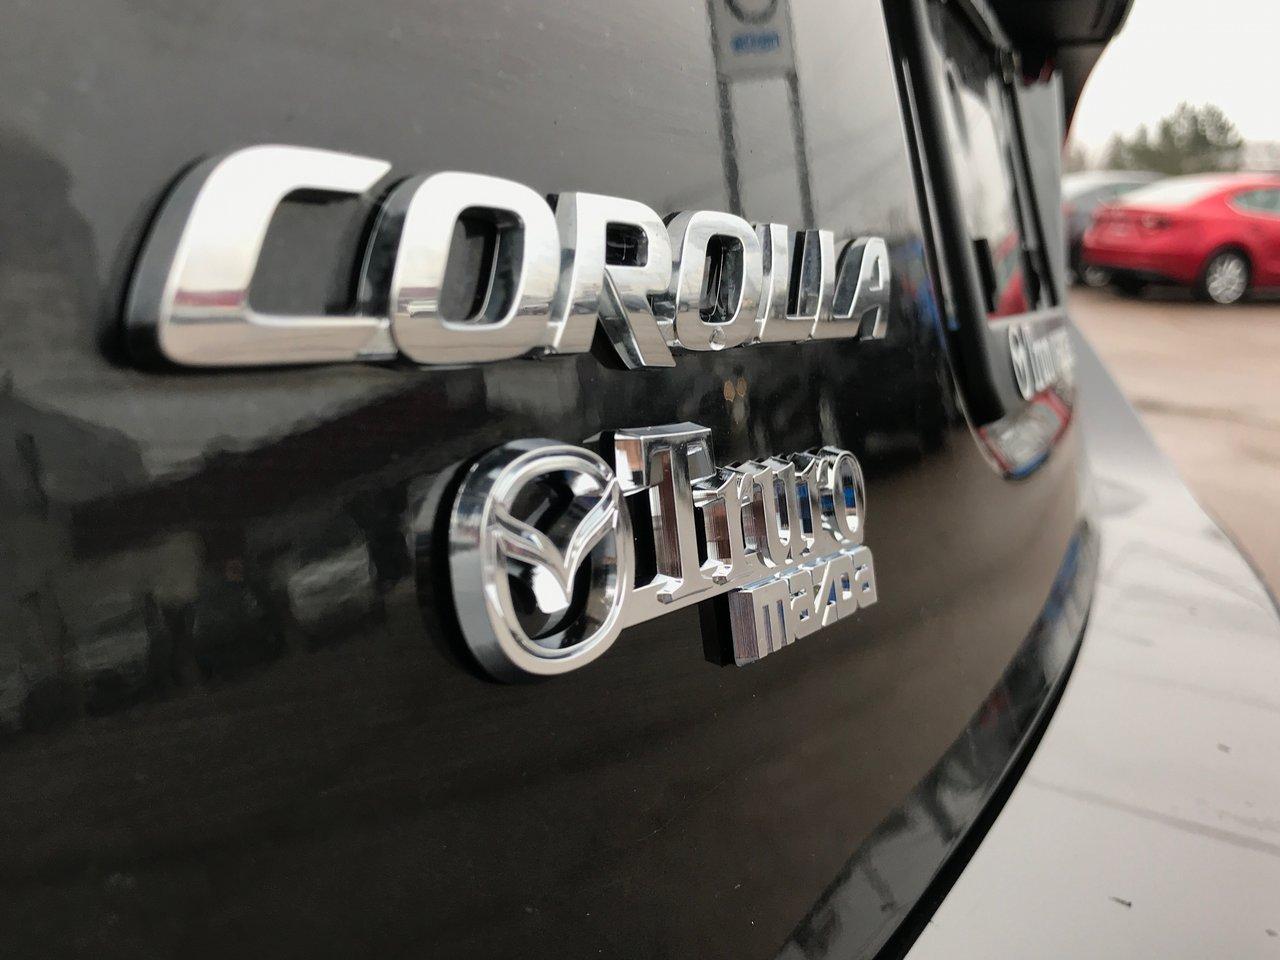 Photo 2014 Toyota Corolla AUTO! HEATED SEATS! NEW TIRES! NEW BRAKES! AUTO! HEATED SEATS! NEW TIRES! NEW BRAKES!